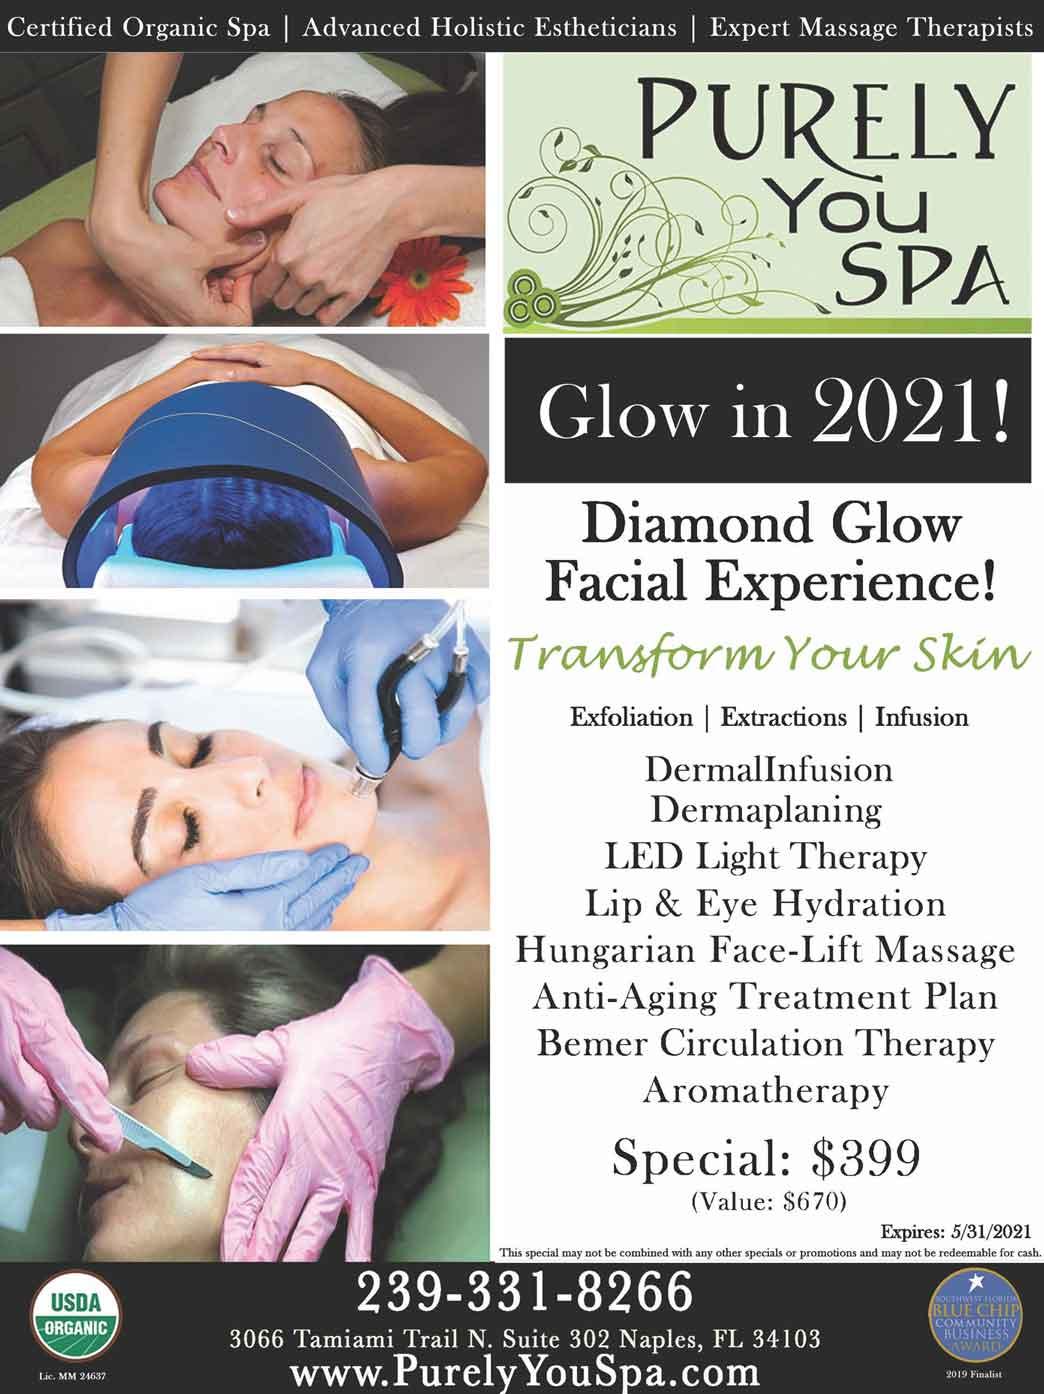 Diamond Glow Facial Experience flyer | Purely You Spa Naples, Florida